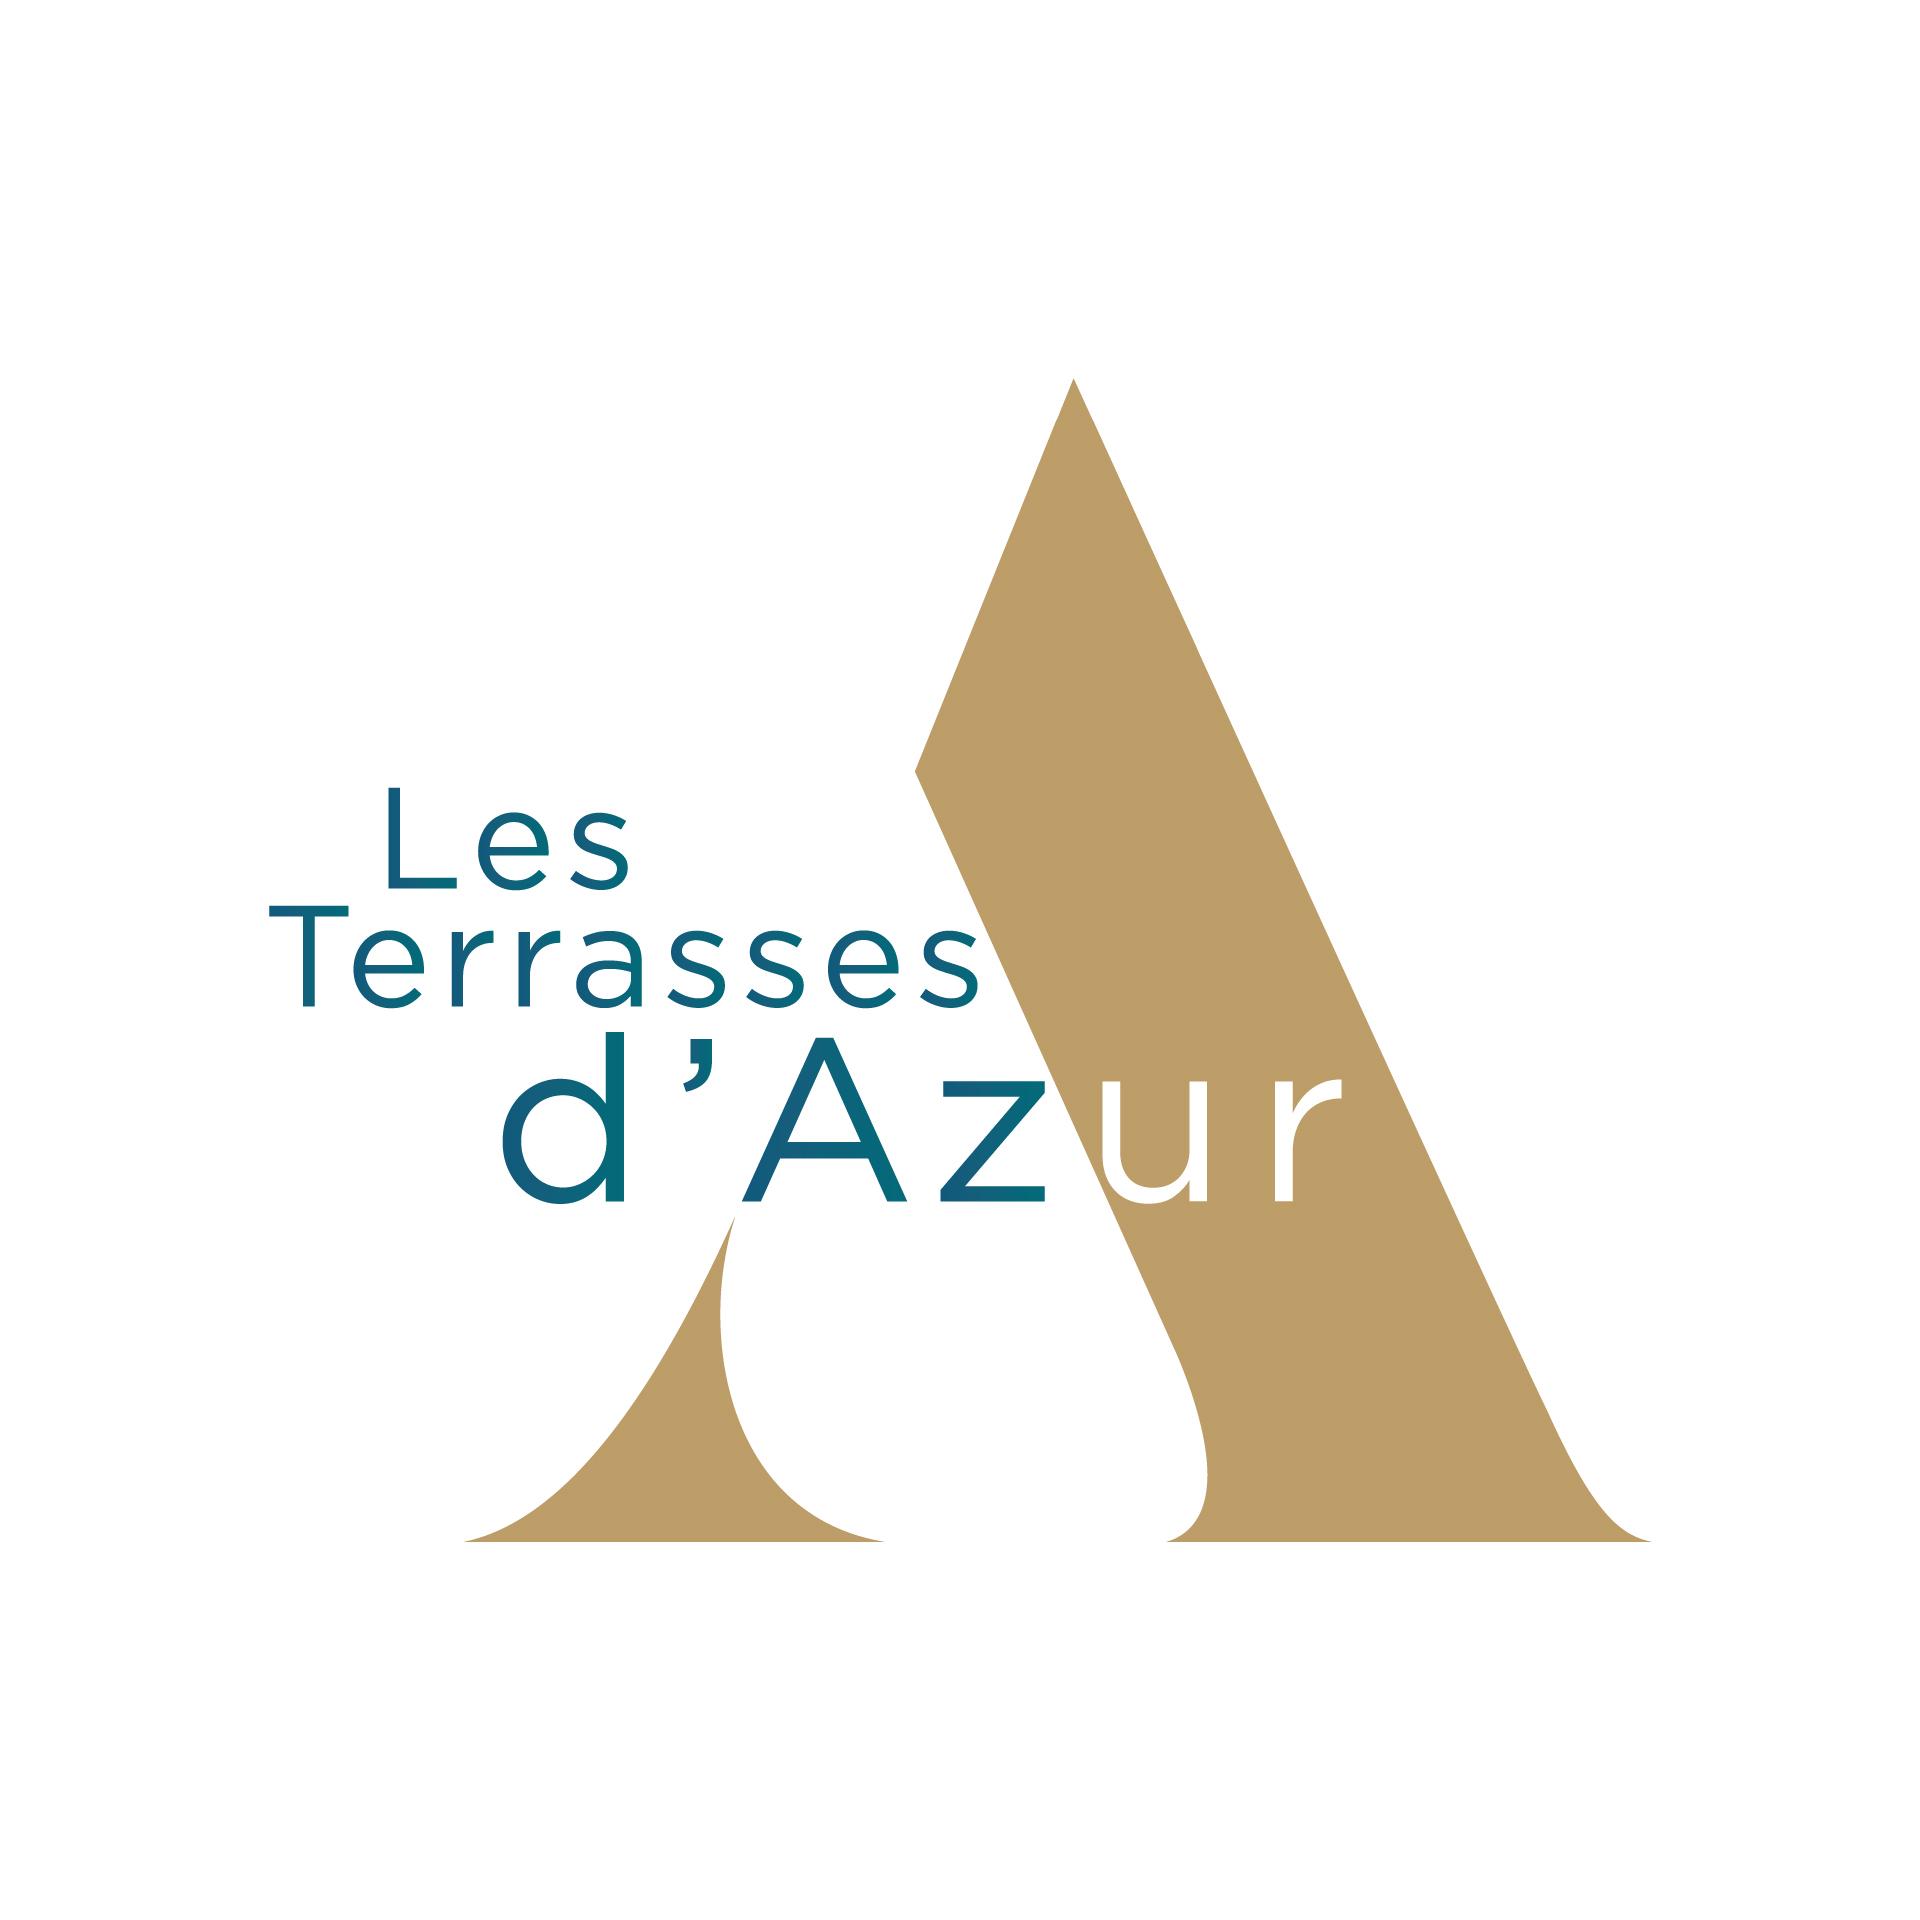 LES TERRASSES D'AZUR